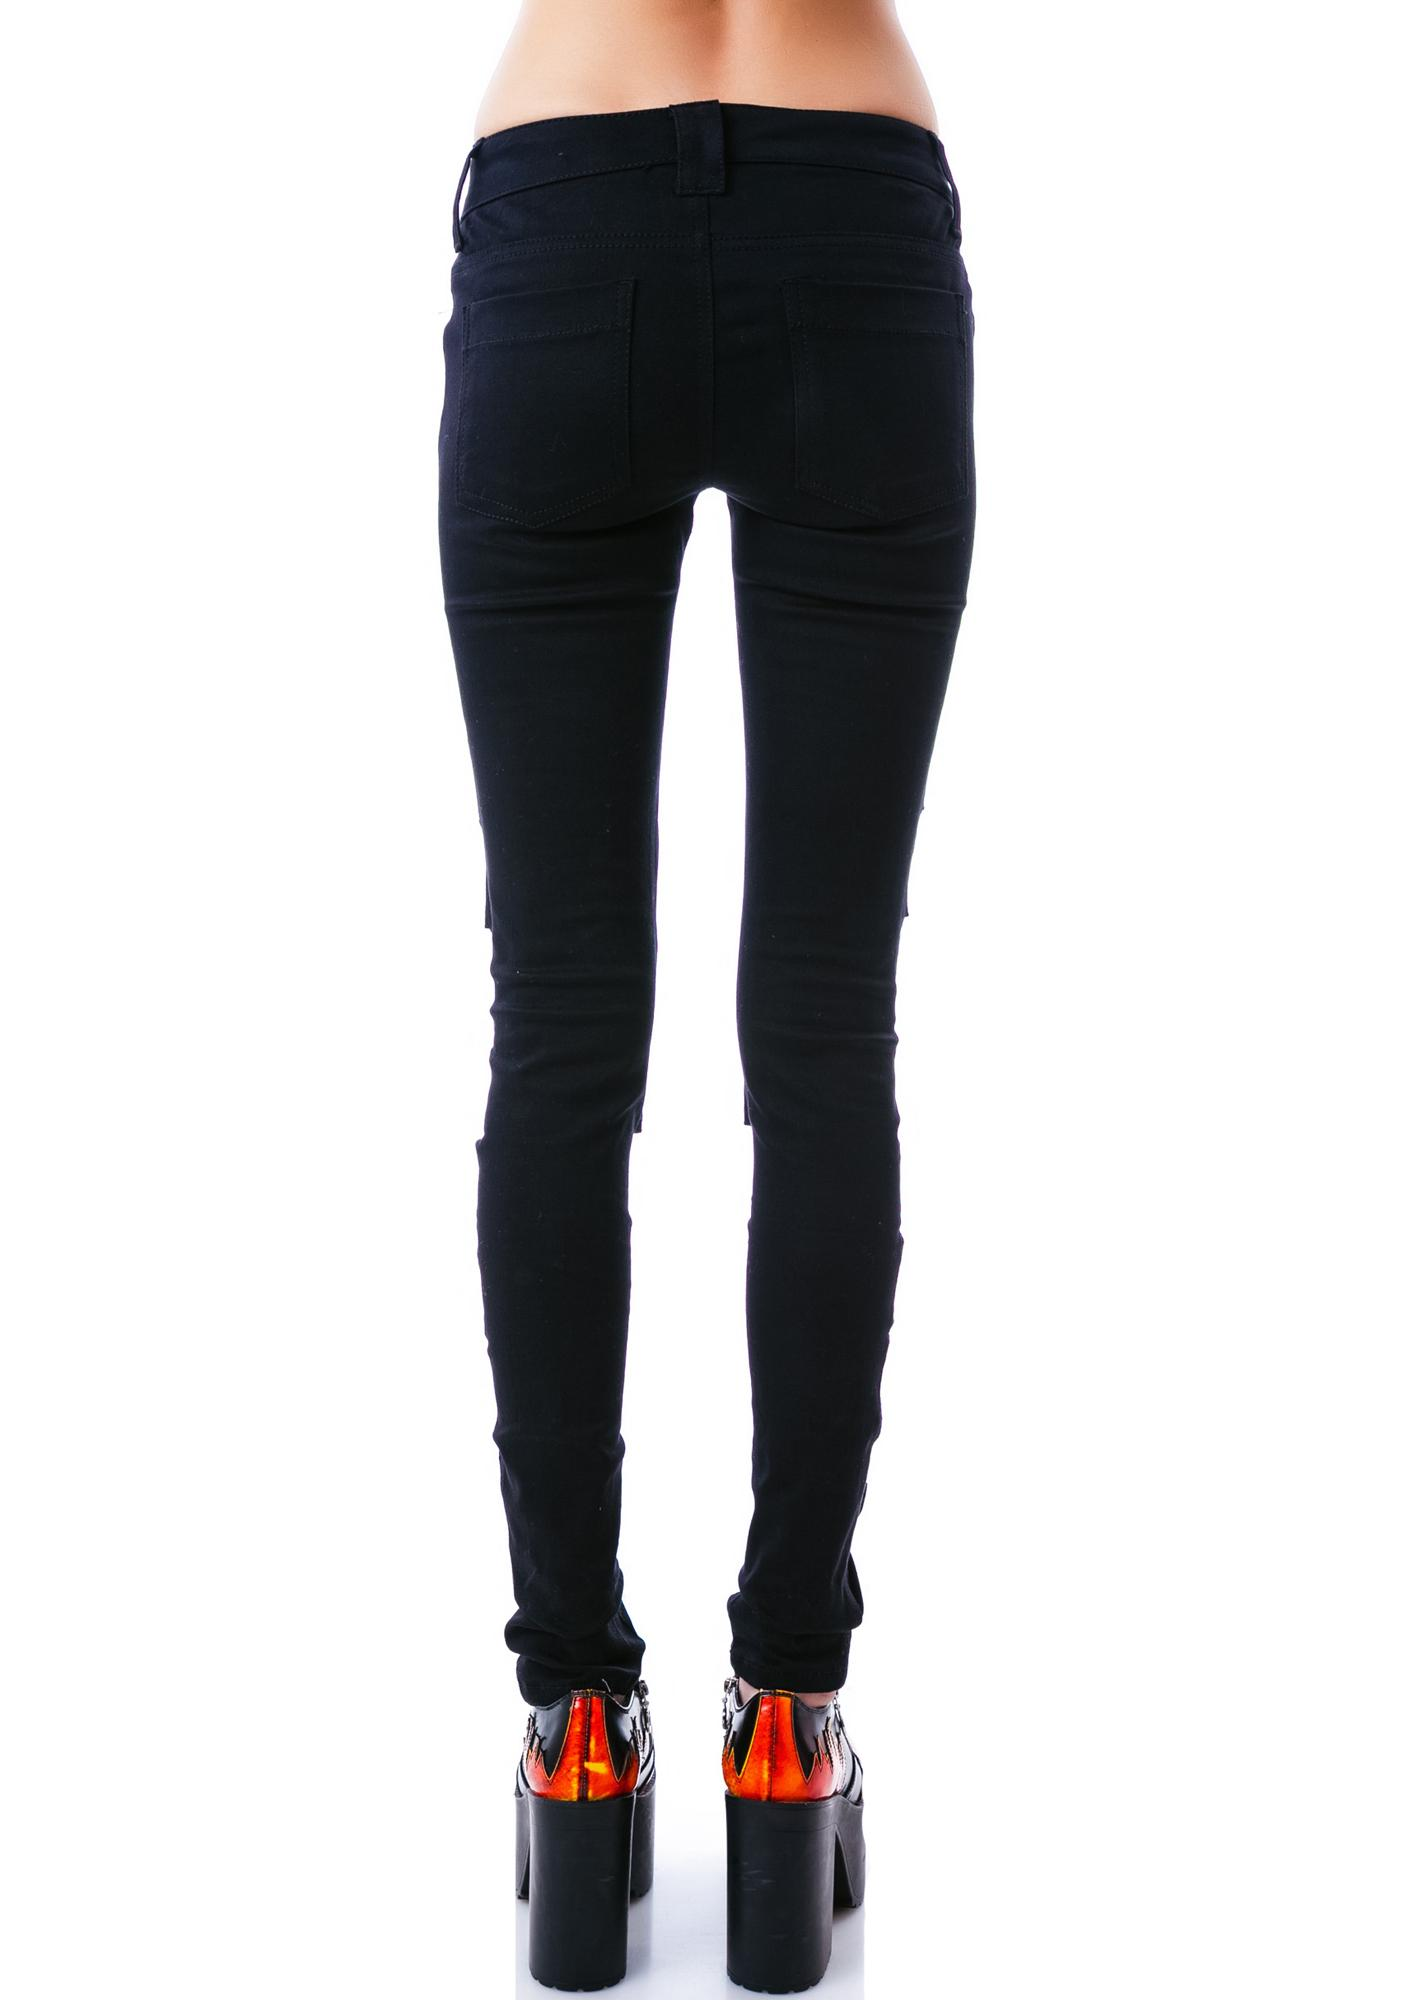 Tripp NYC Super Slit Jeans